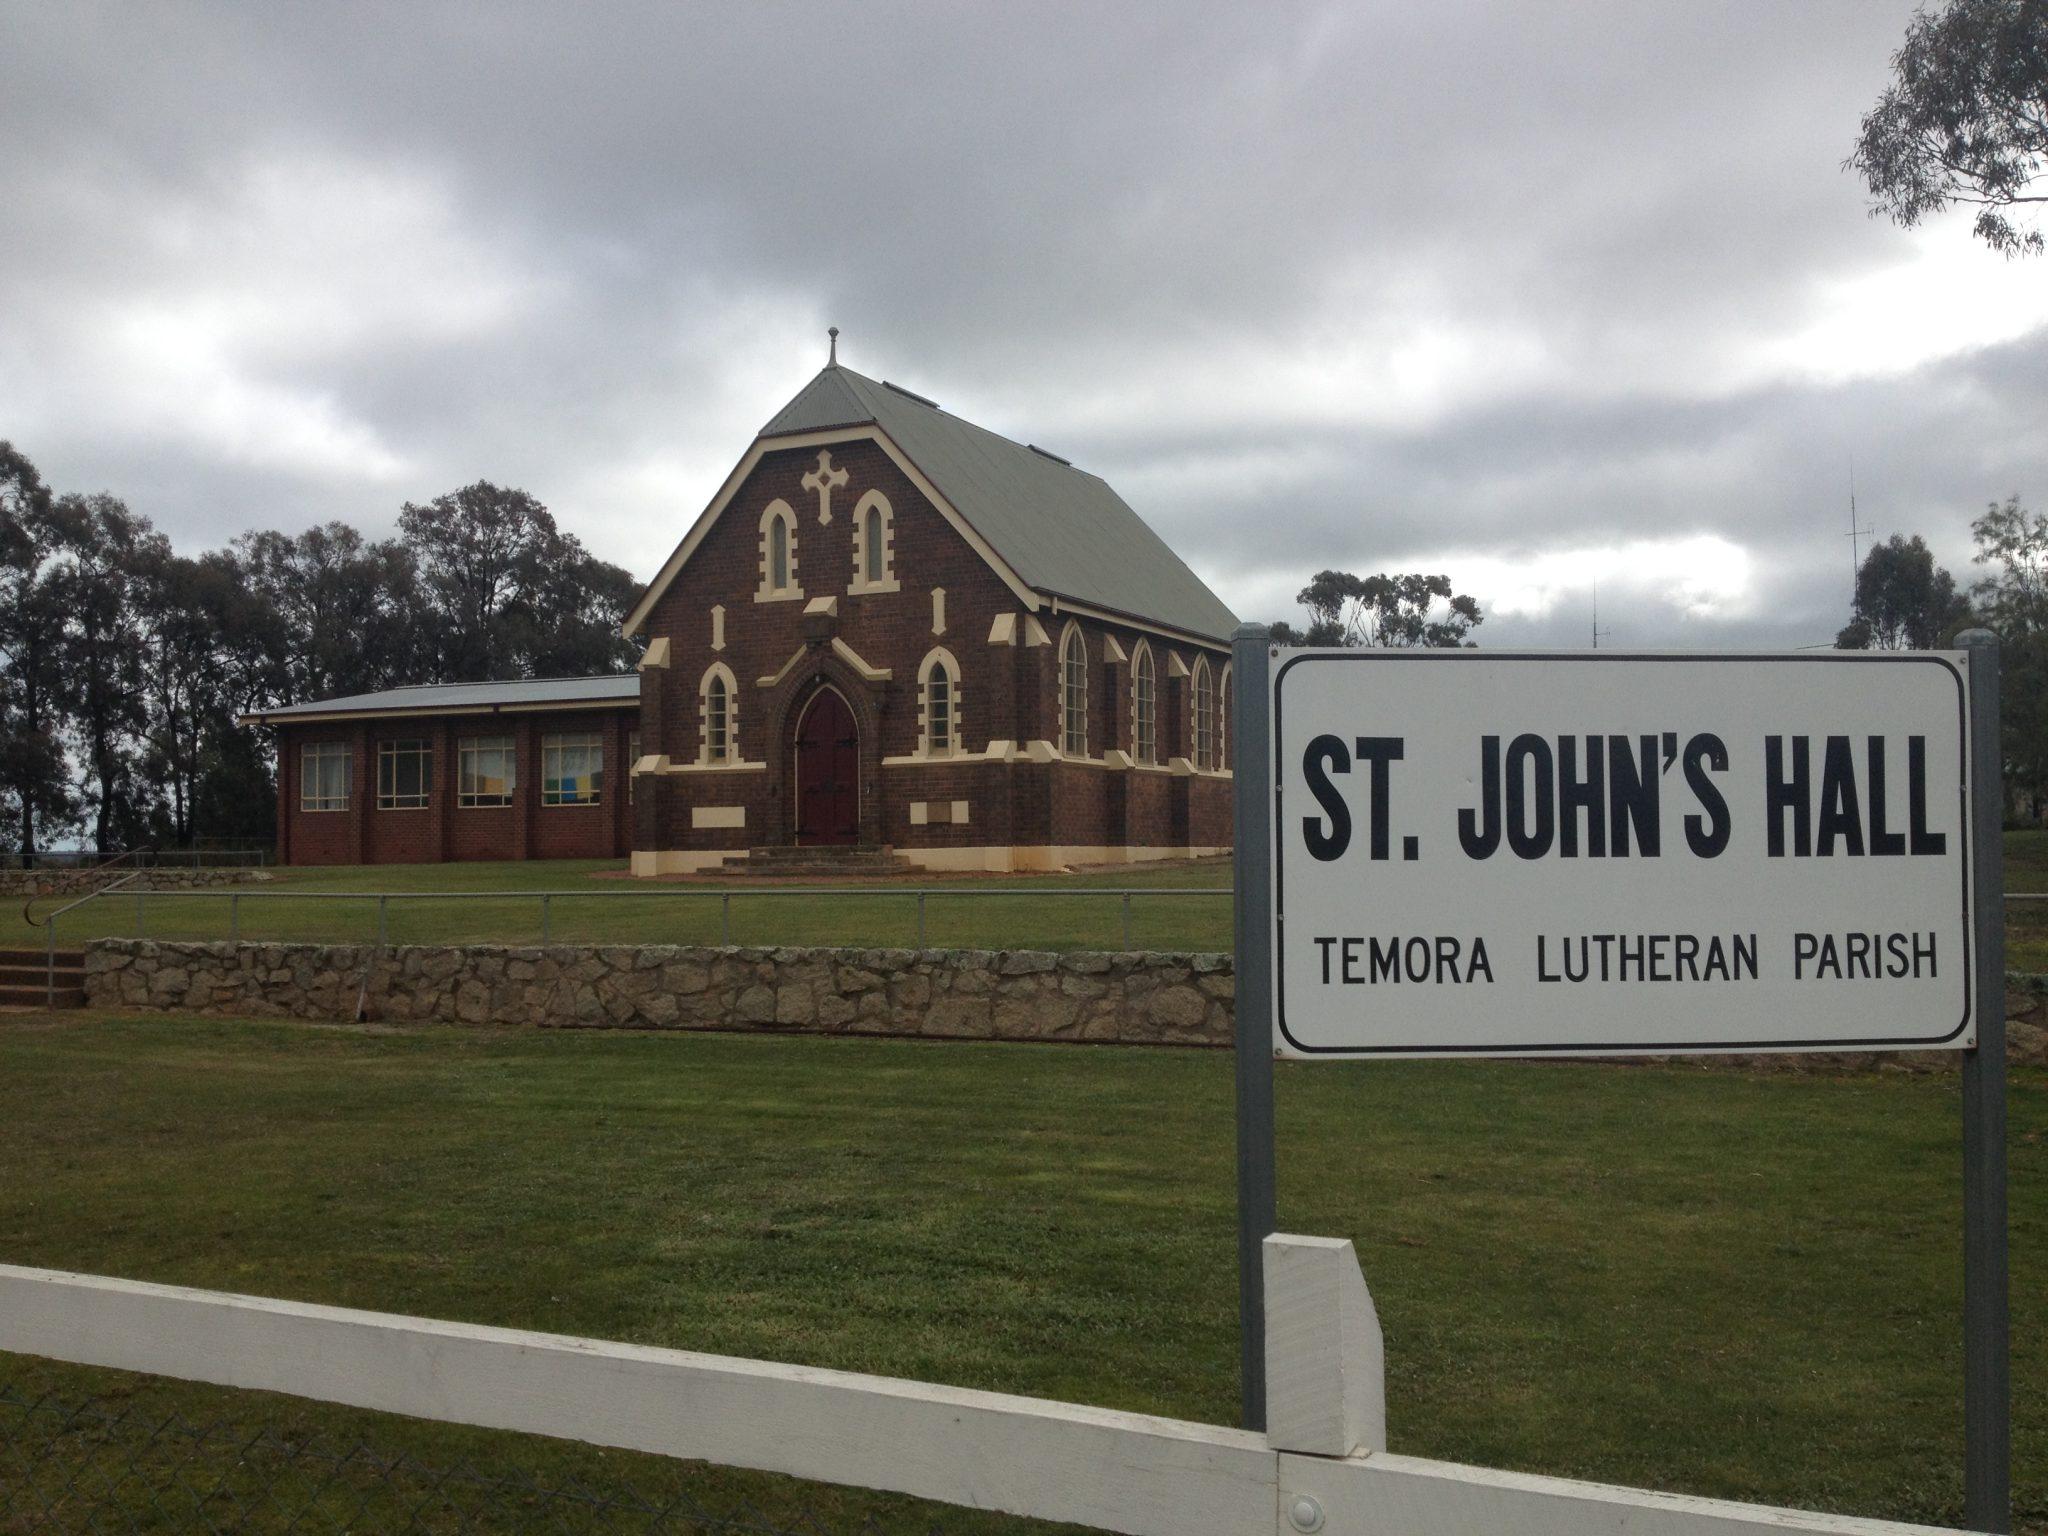 St Johns Hall